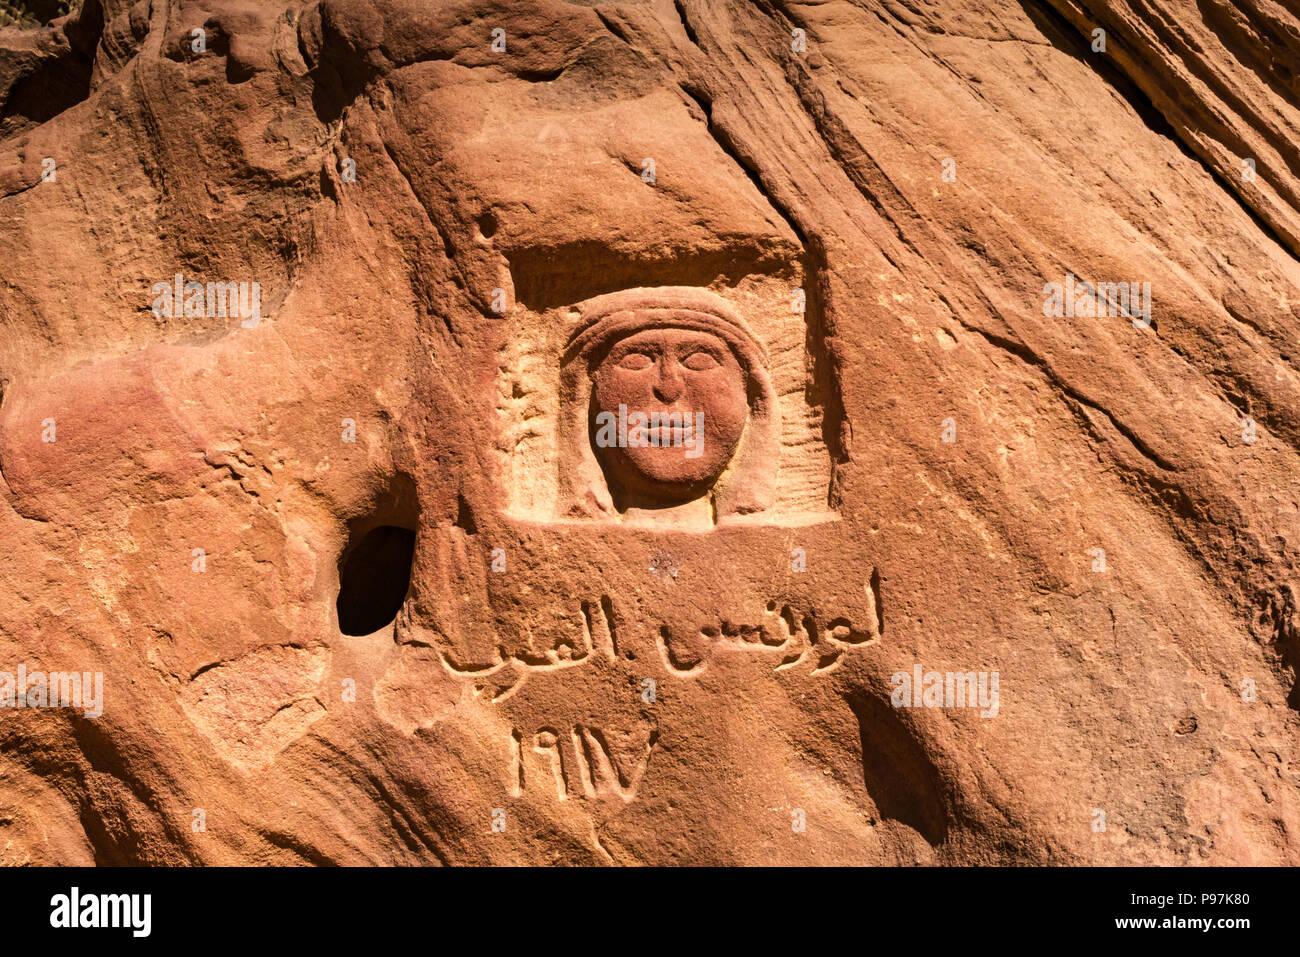 Arab headdress stock photos images